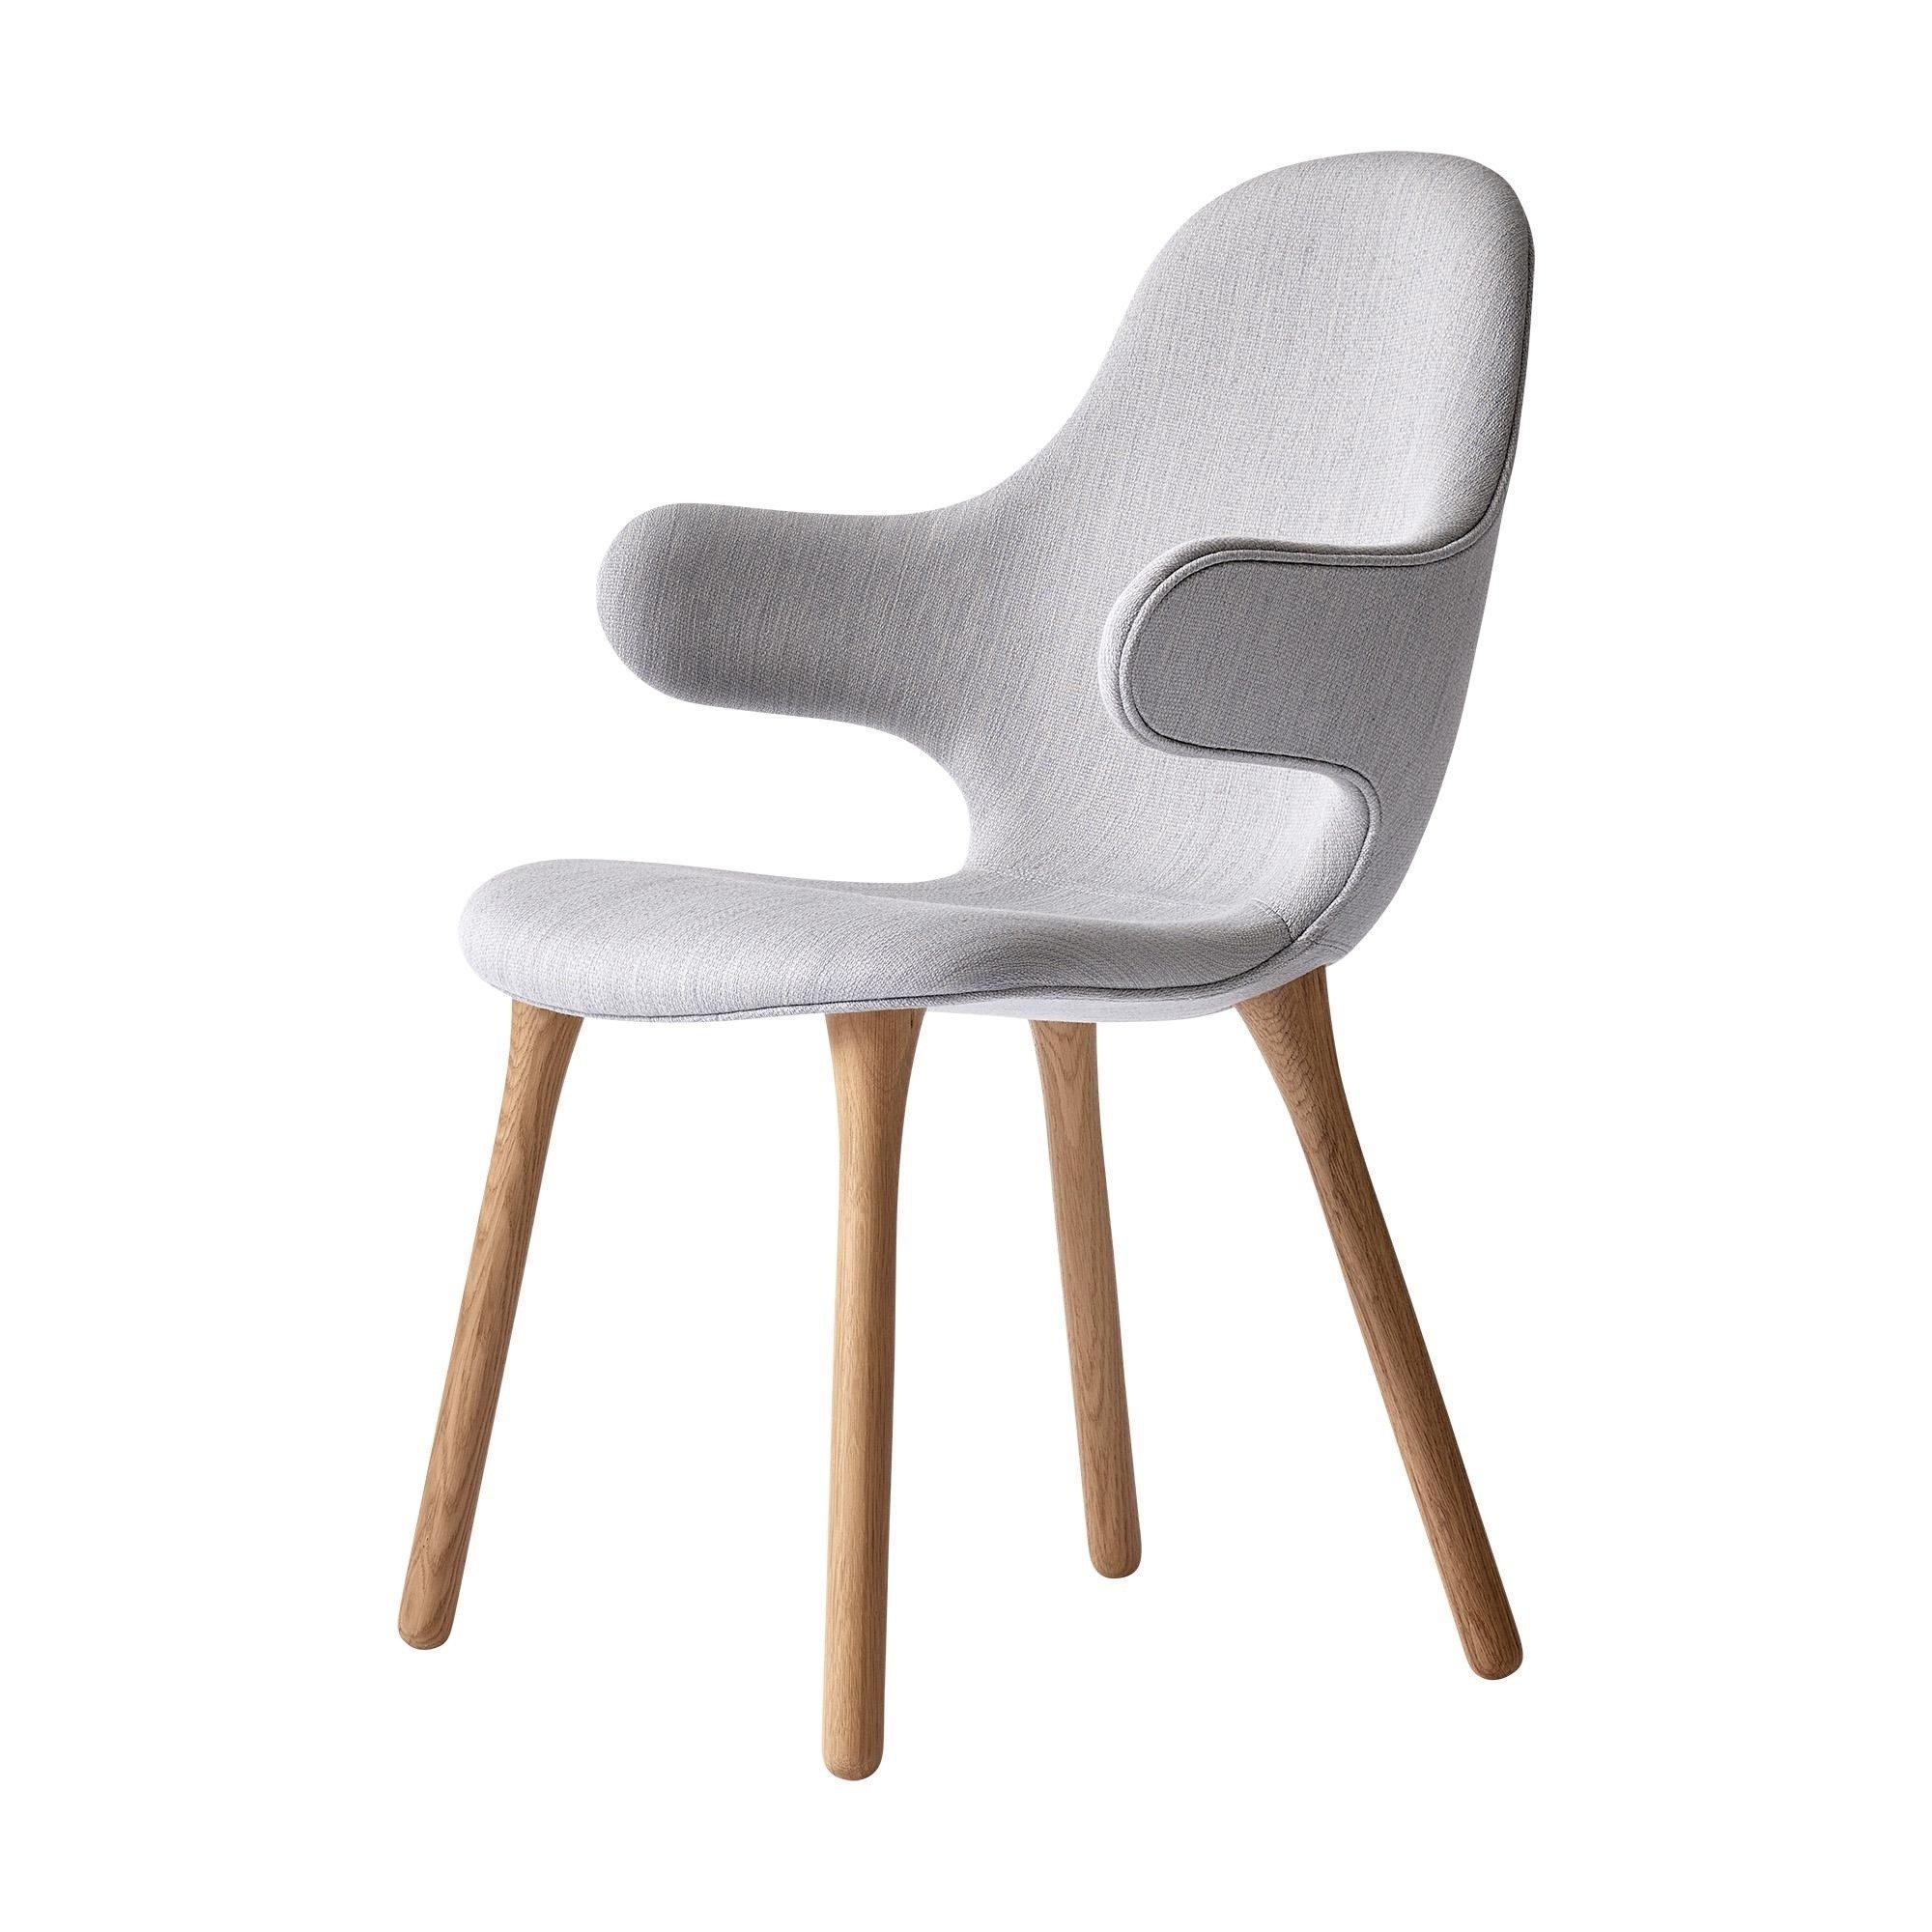 Catch chair jh1 stuhl gestell eiche tradition for Stuhl design entwicklung